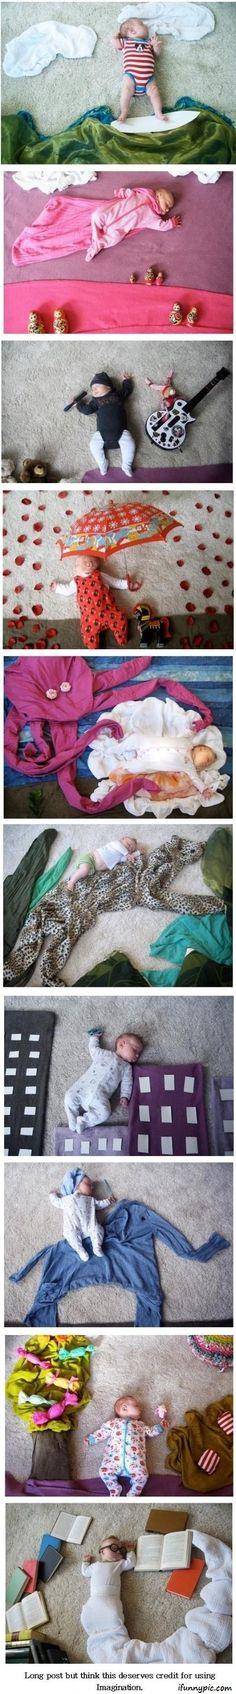 MLHA. Fotos divertidas con bebes.